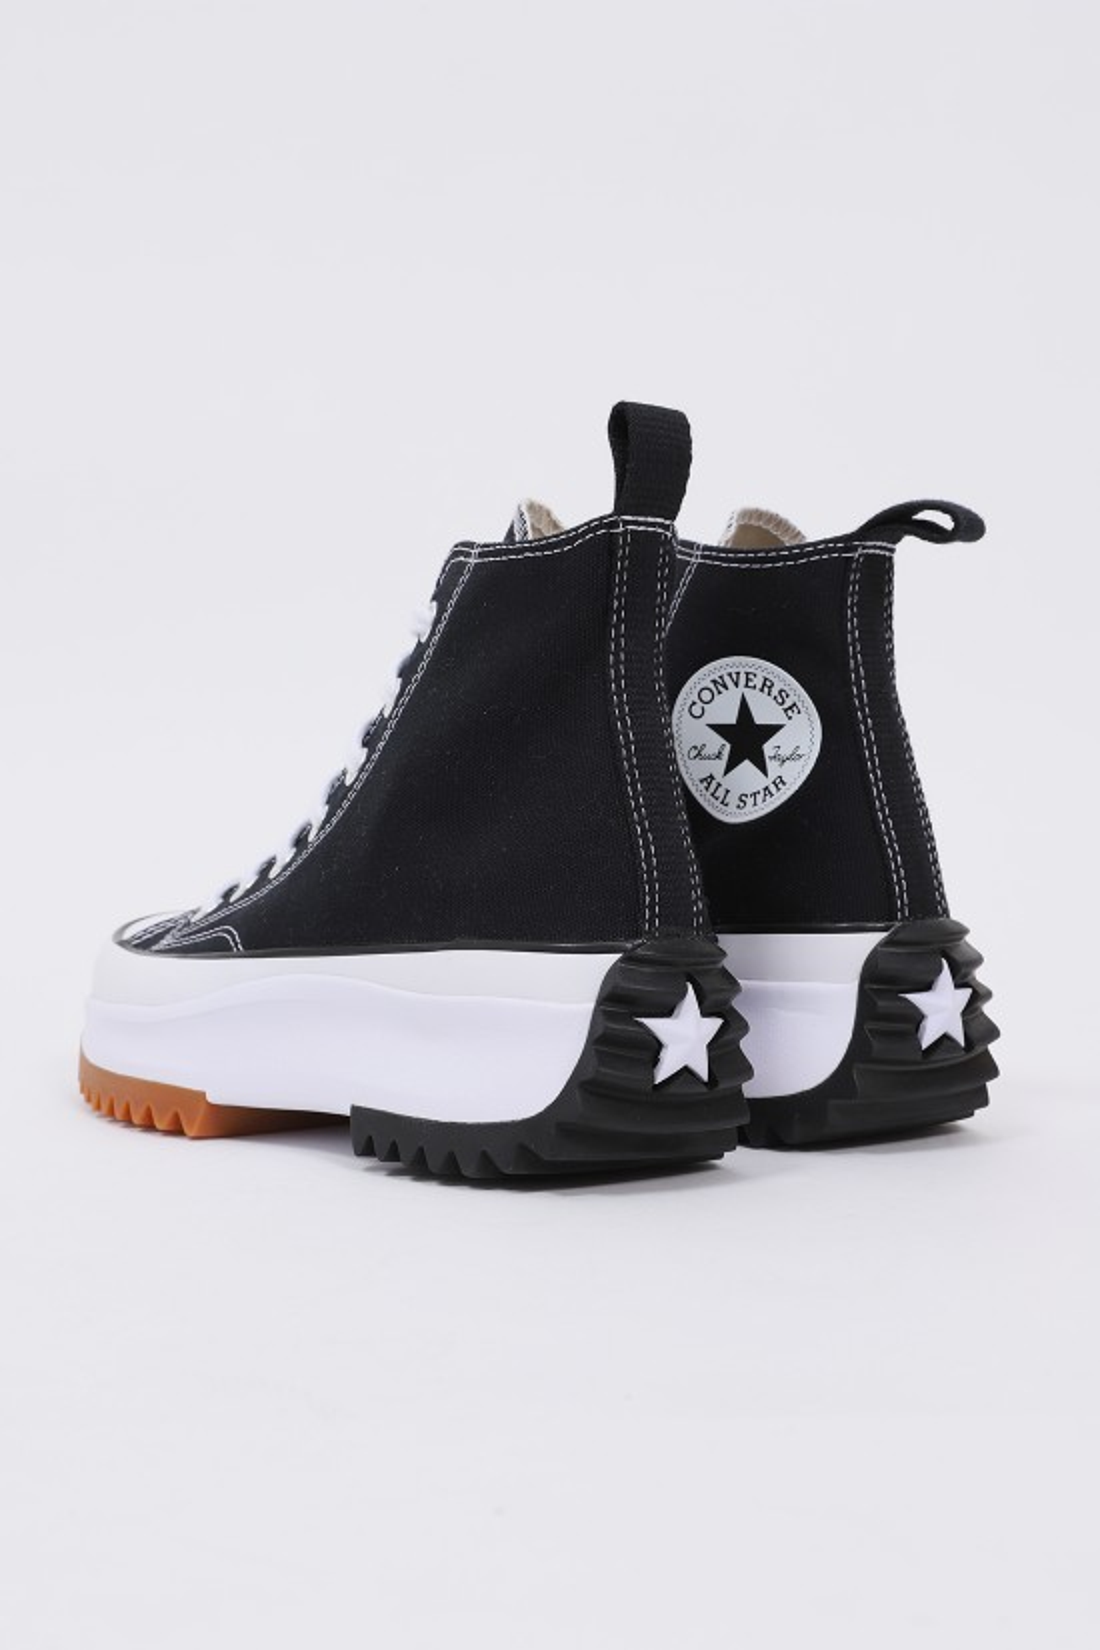 CONVERSE / Run star hike hi Black